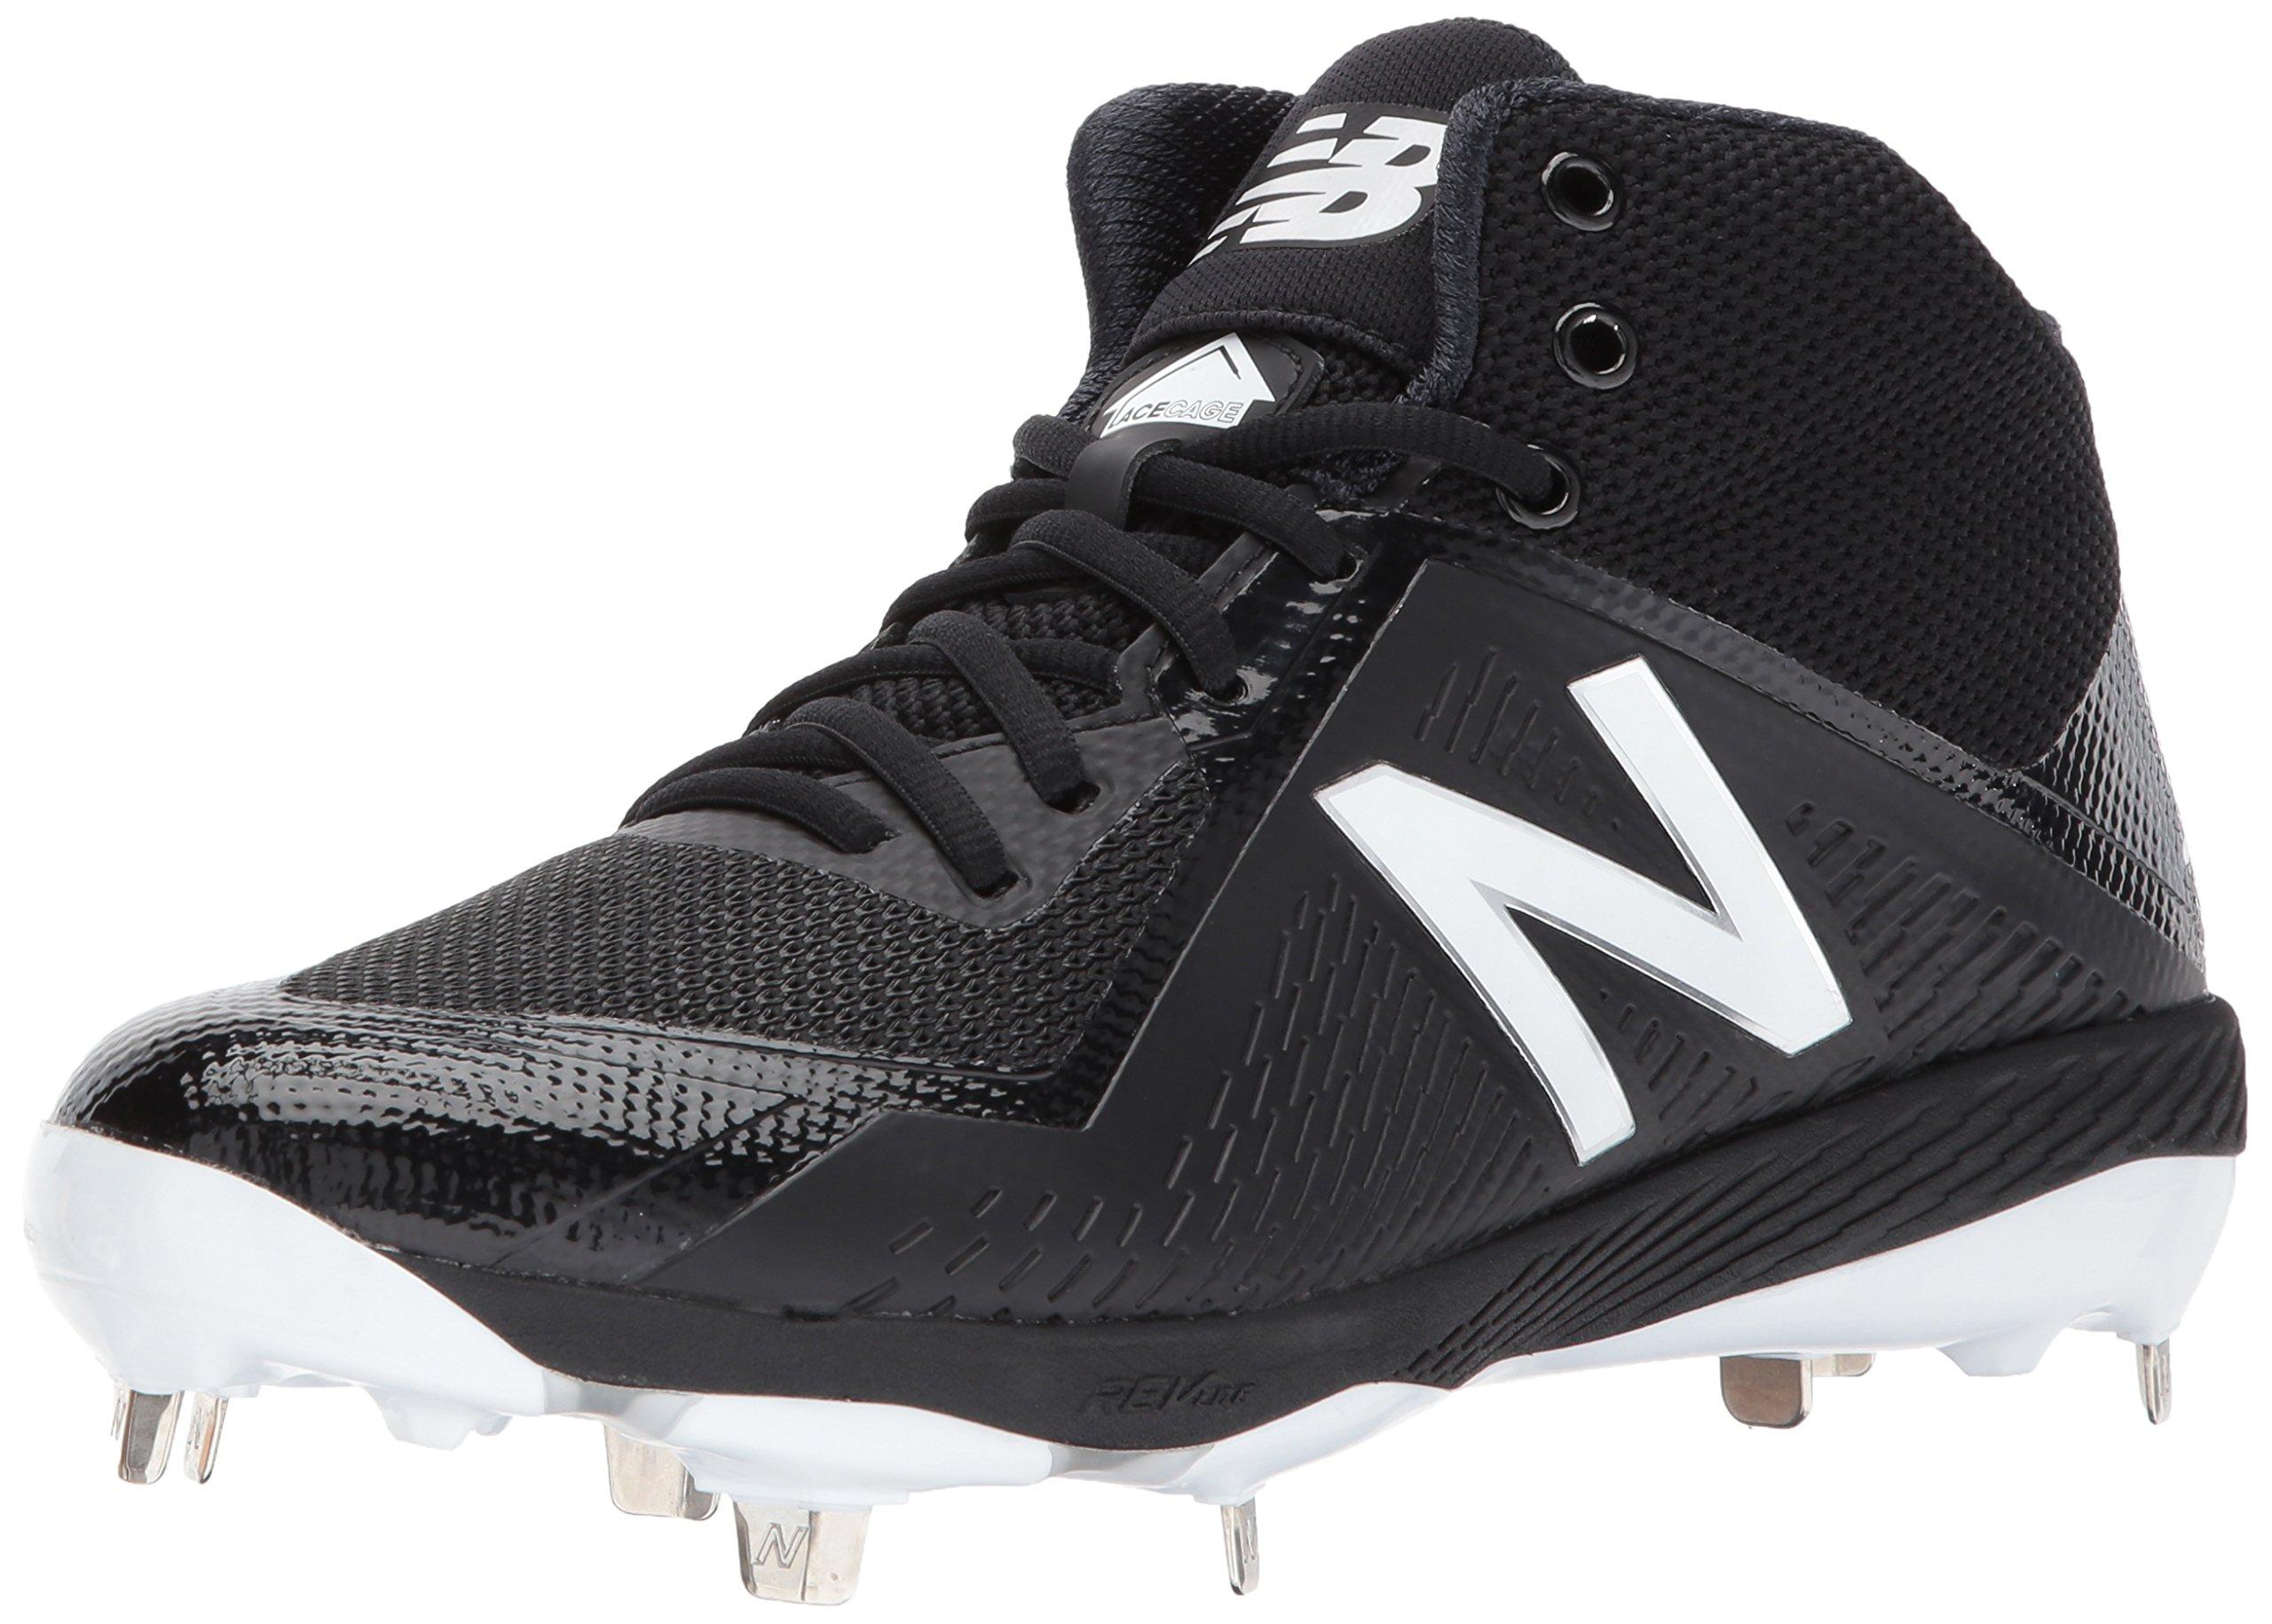 New Balance Men's M4040v4 Metal Baseball Shoe, Black, 11 D US by New Balance